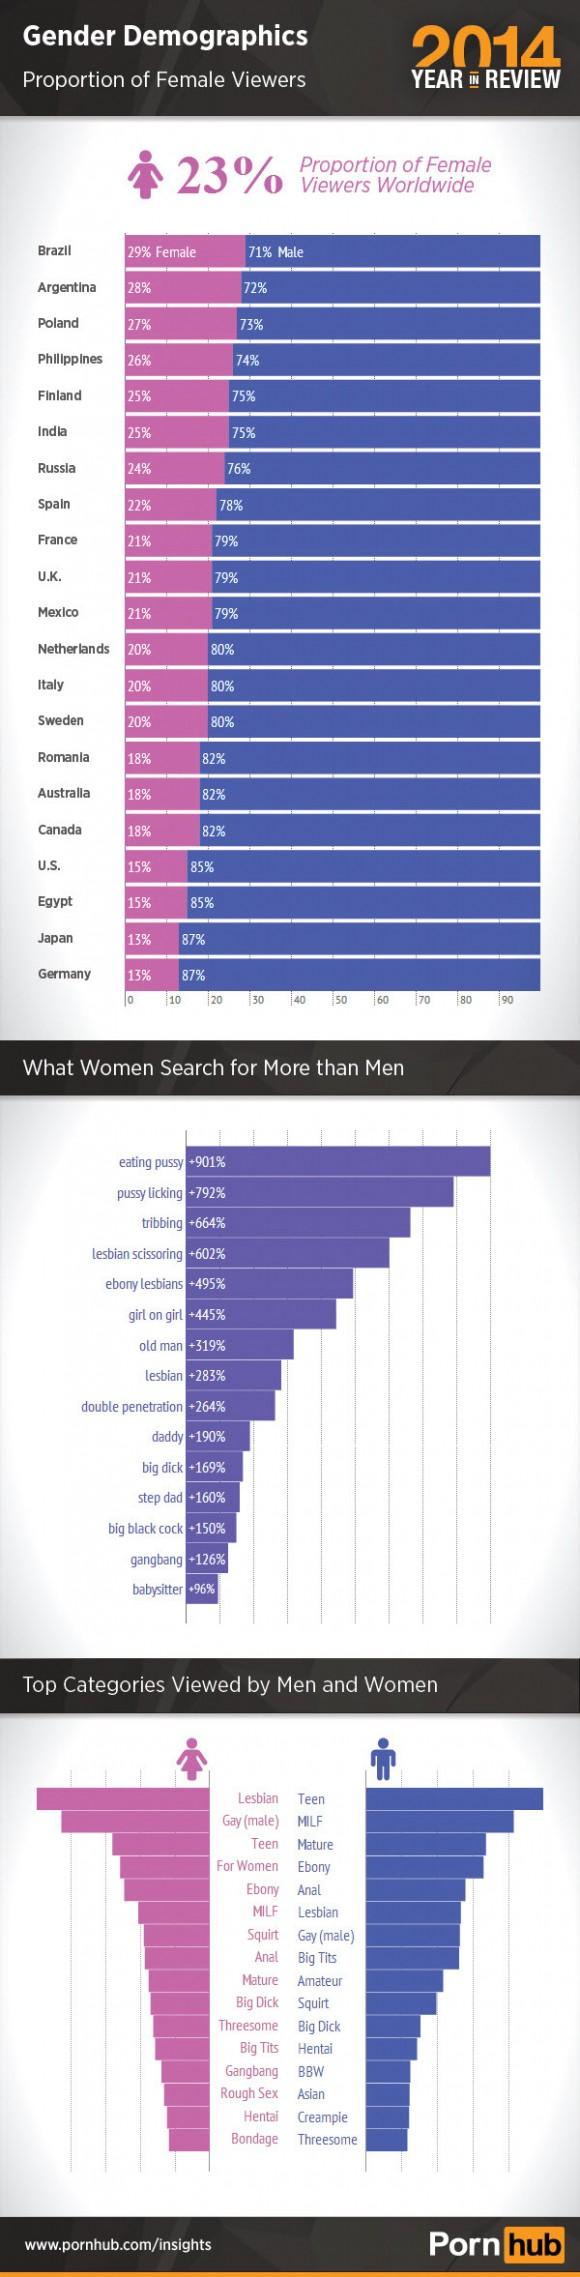 2-pornhub-2014-gender-demographics